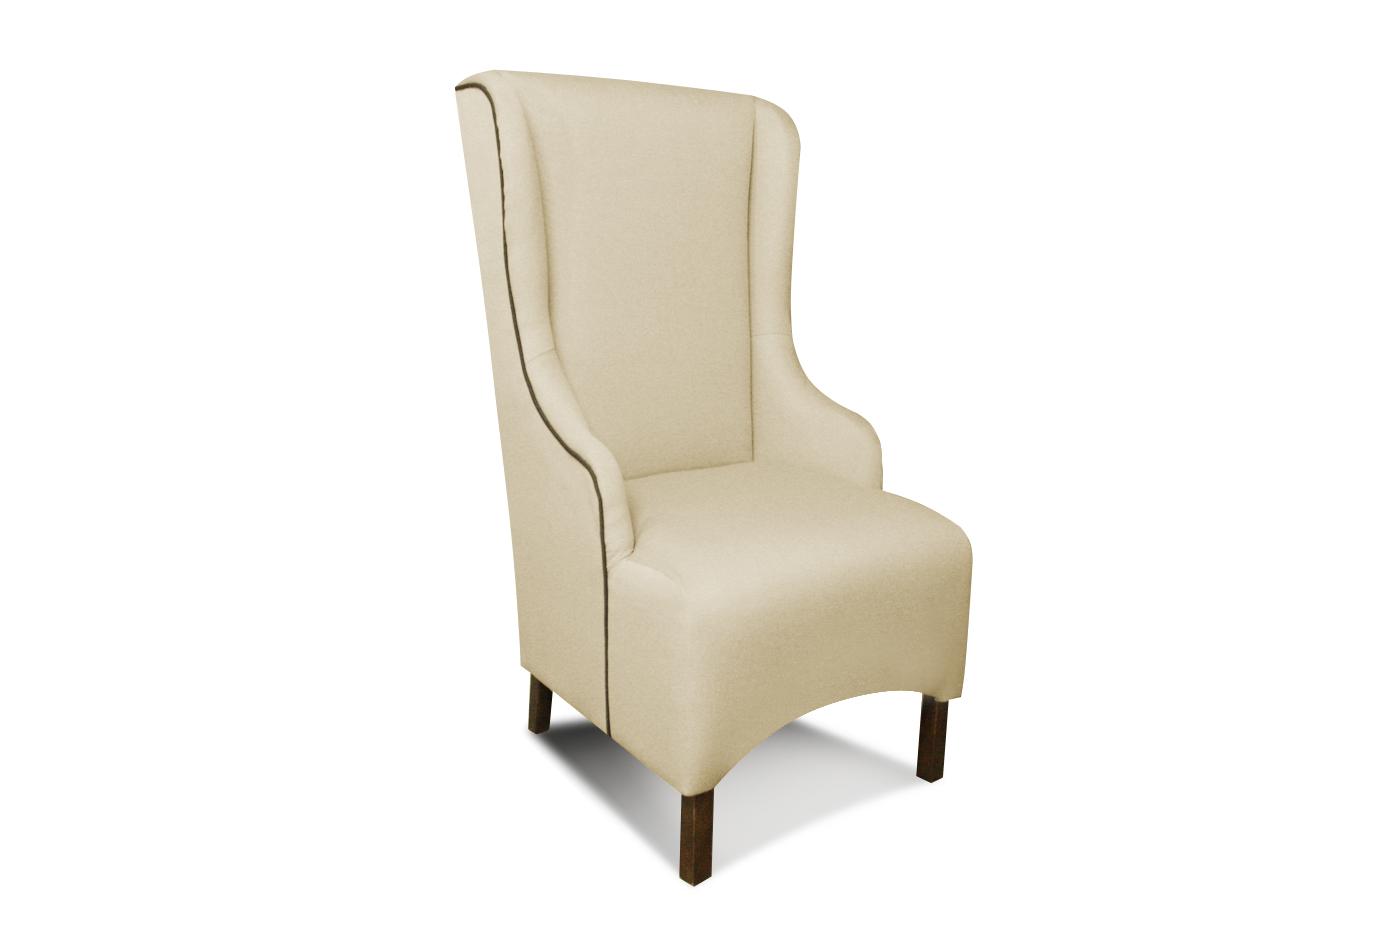 fotele fabio wzór krata